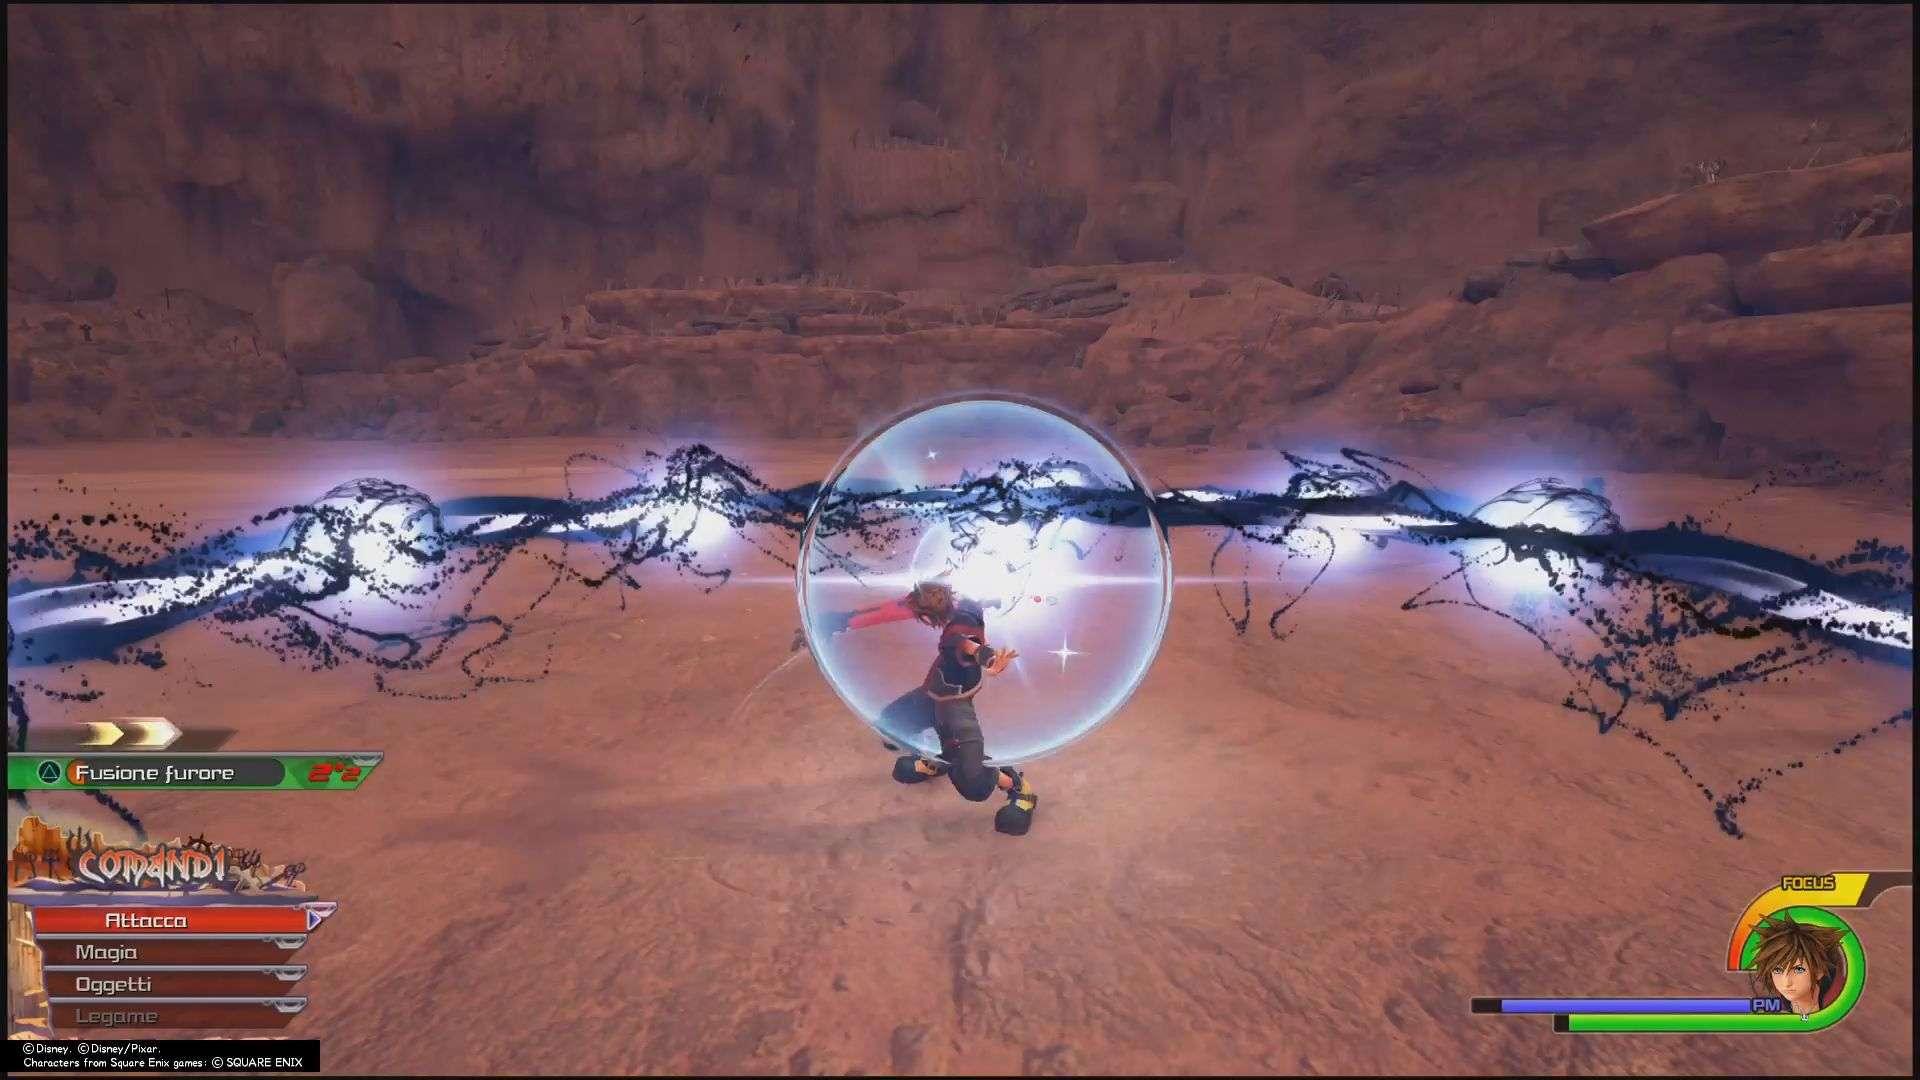 Kingdom Hearts III boss segreto Inferno Nero